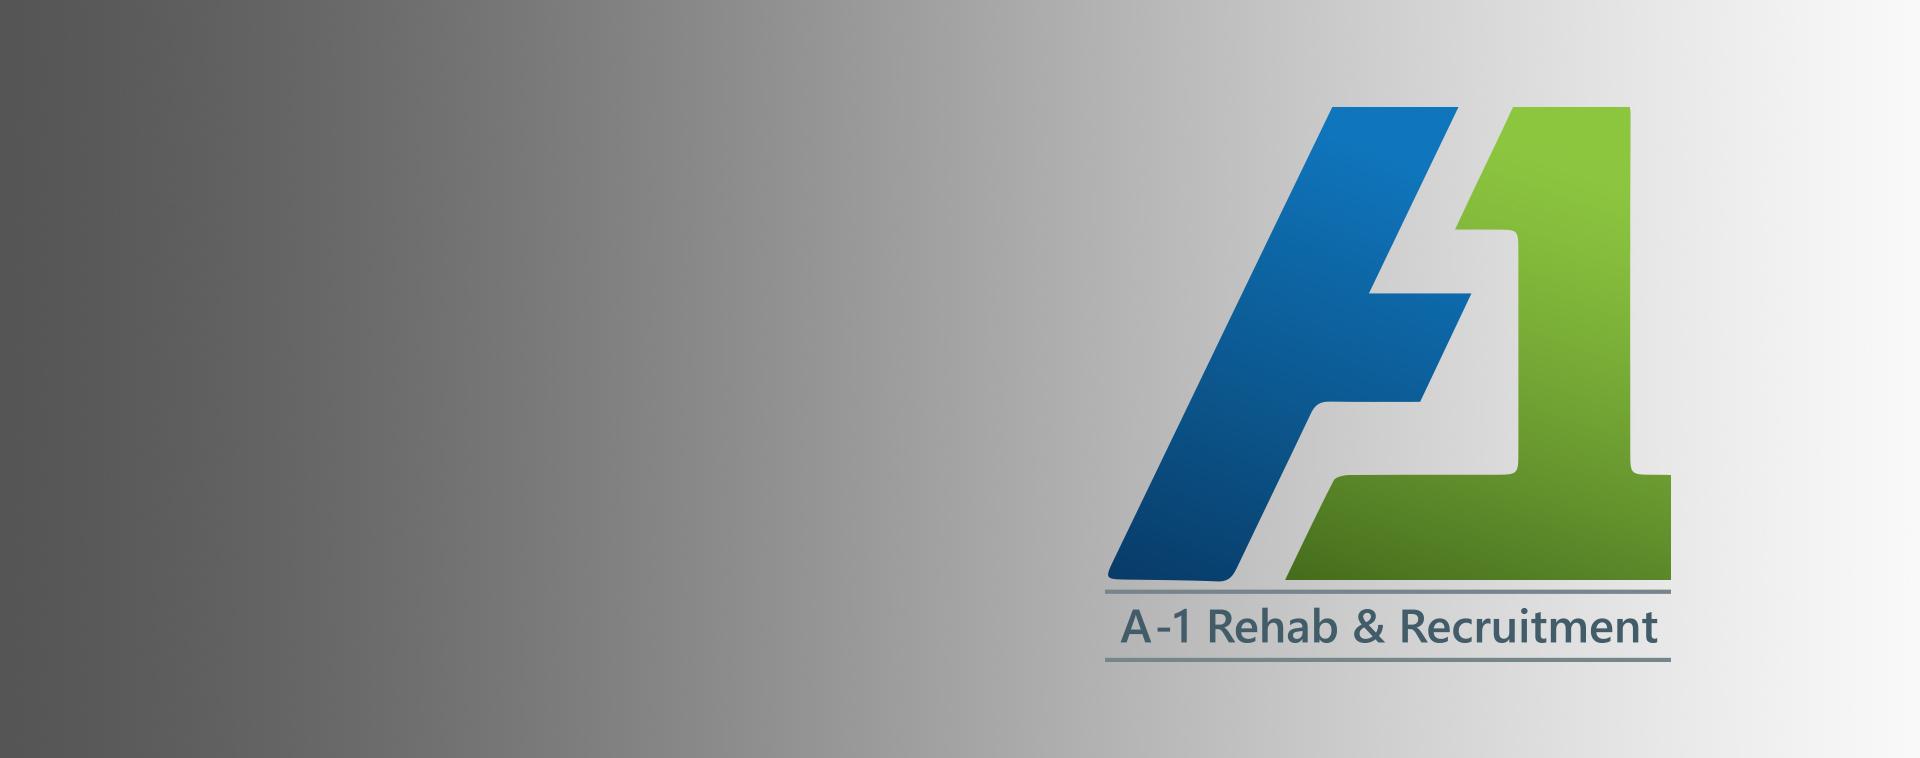 A1 Rehab & recruitment logo